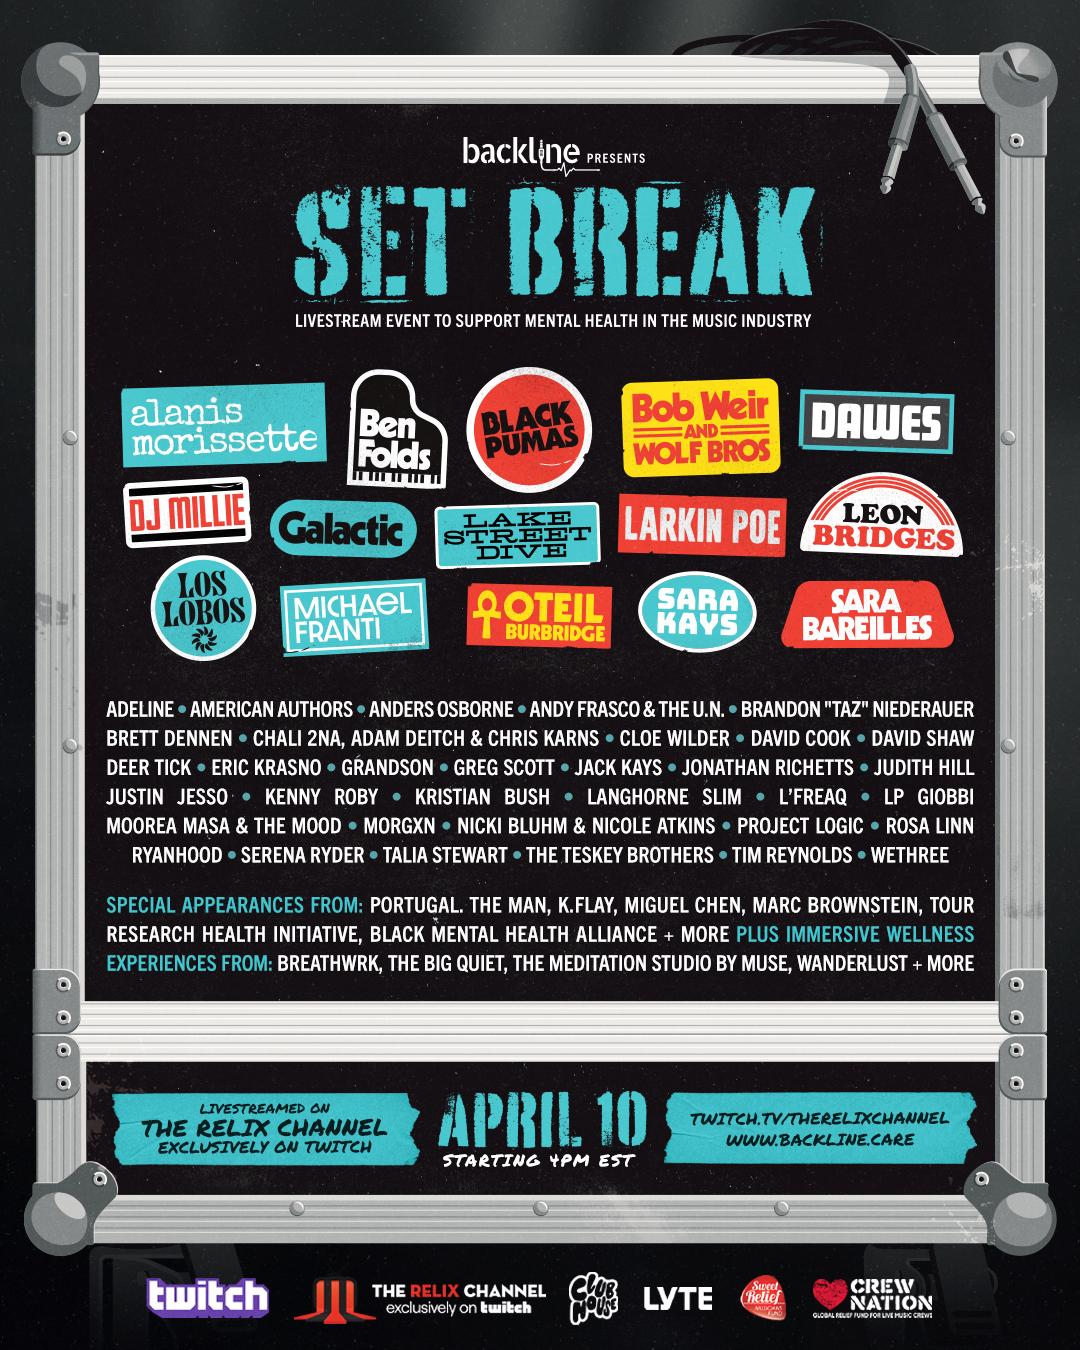 Free live stream music fundraiser 10th April via Twitch 4pm EST (9pm BST)